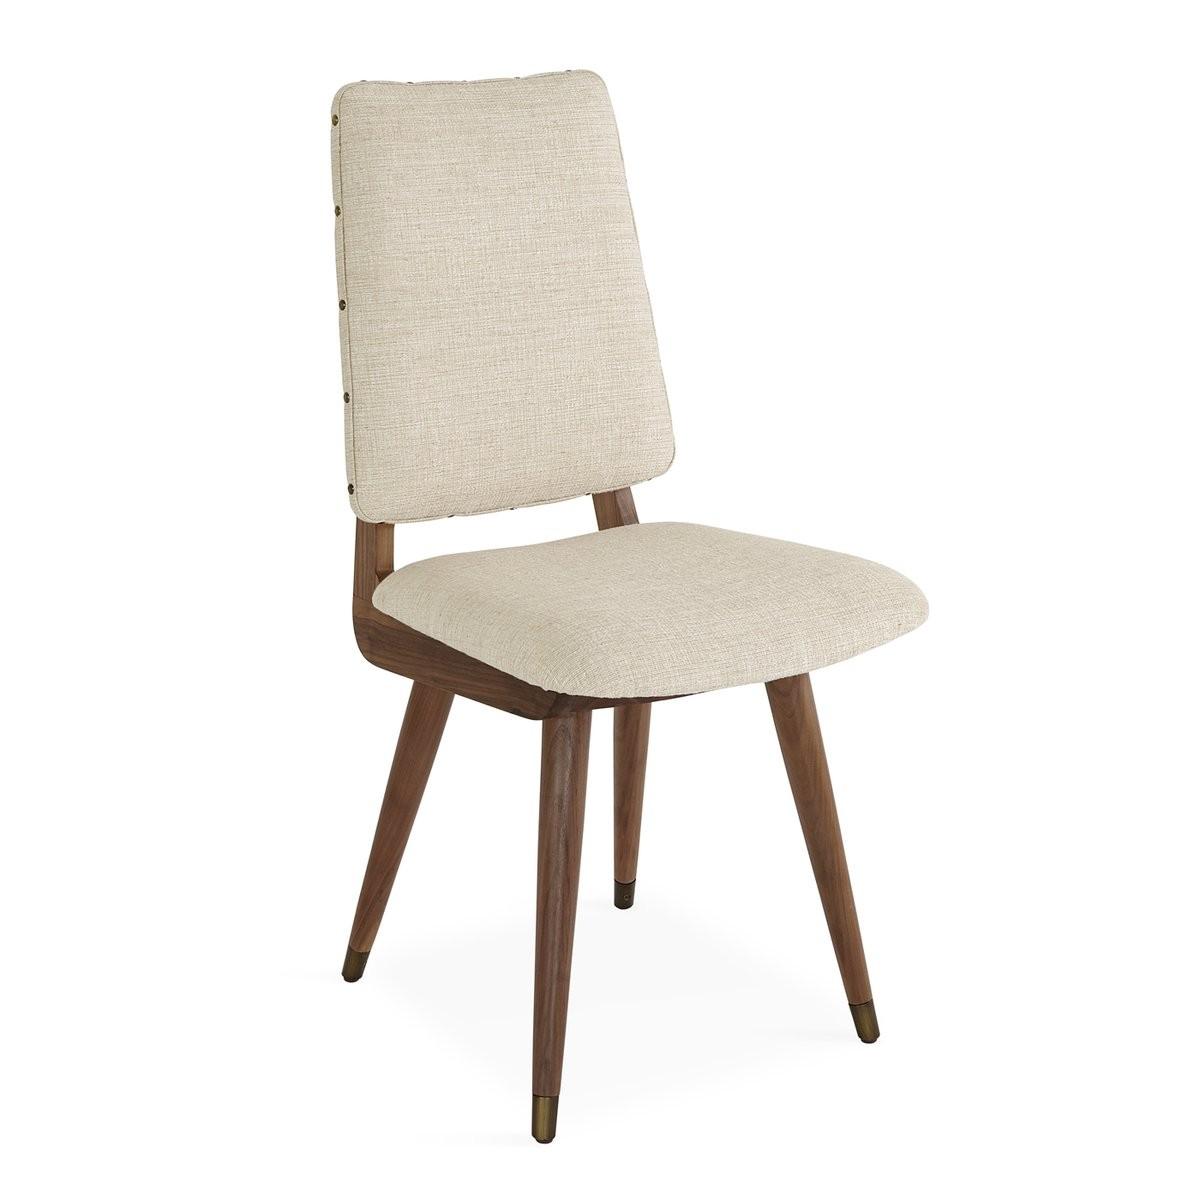 Jonathan Adler I Camille Dining Chair